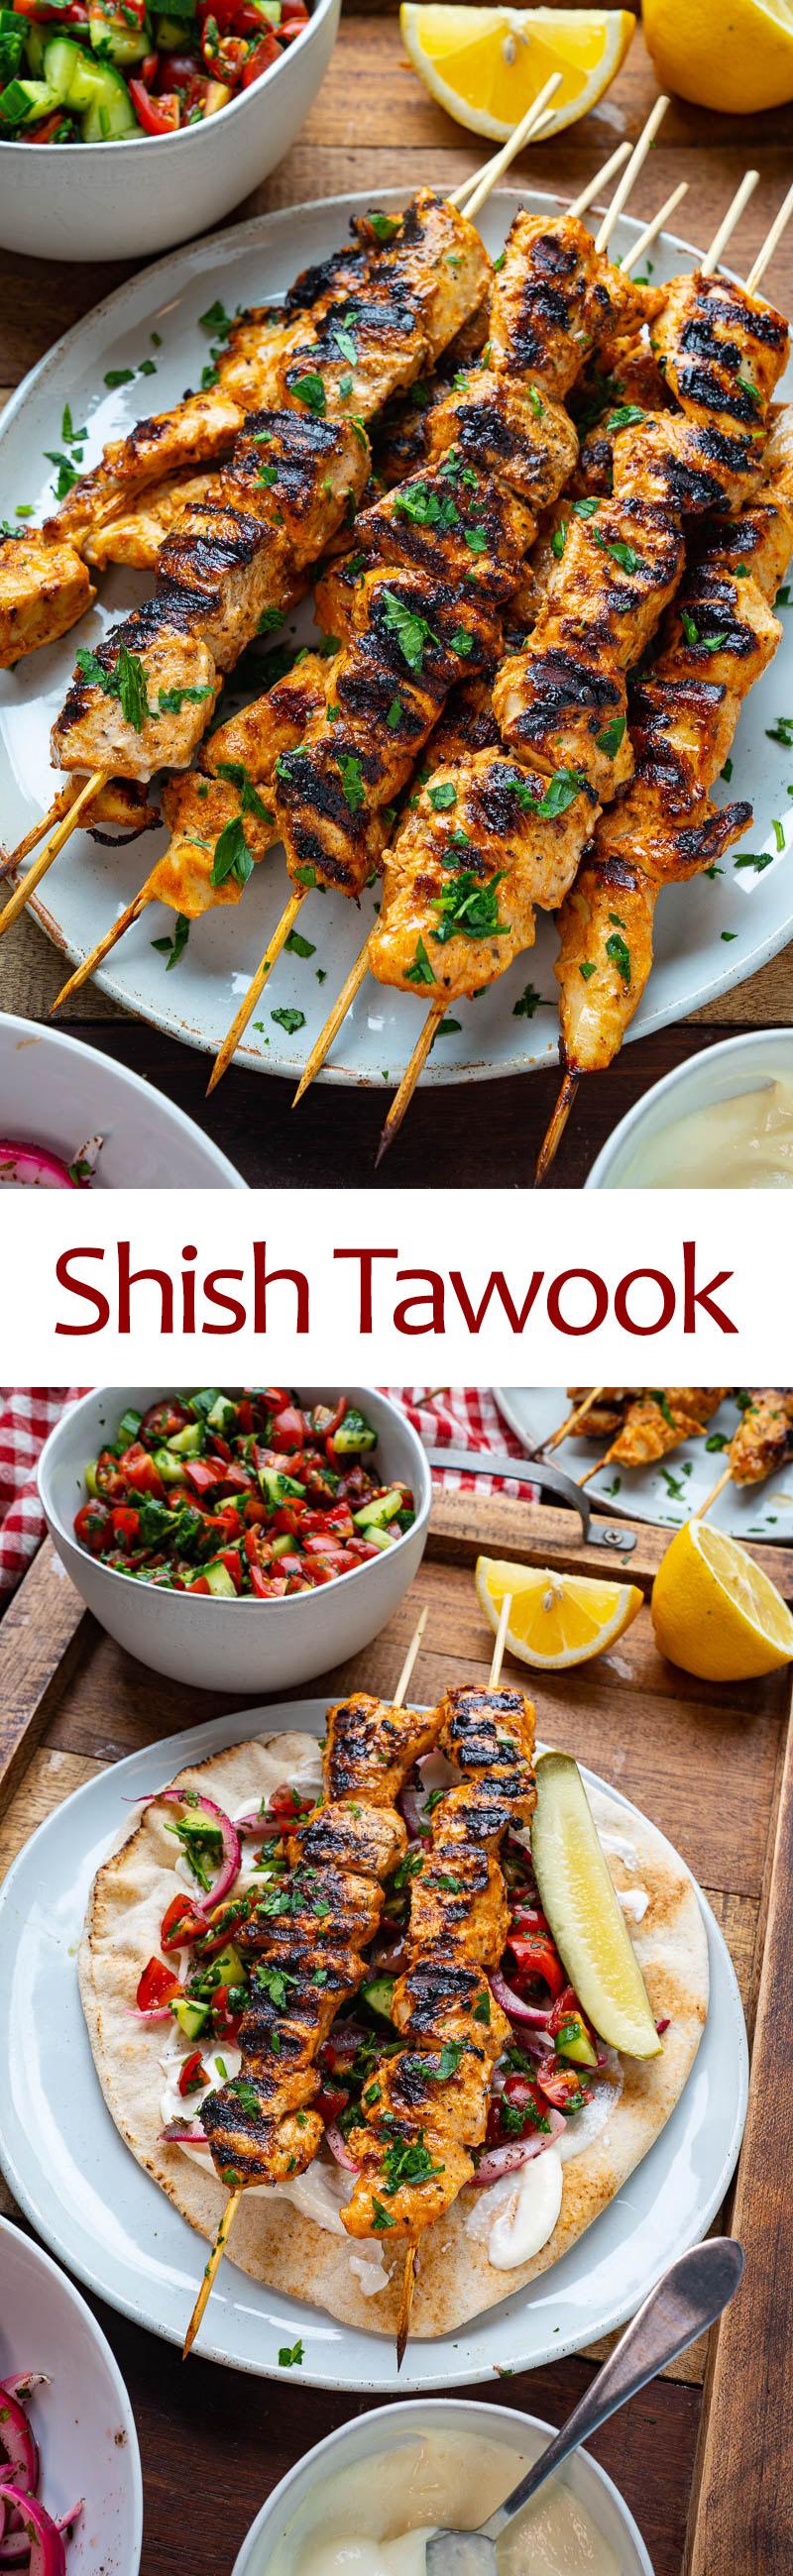 Shish Tawook